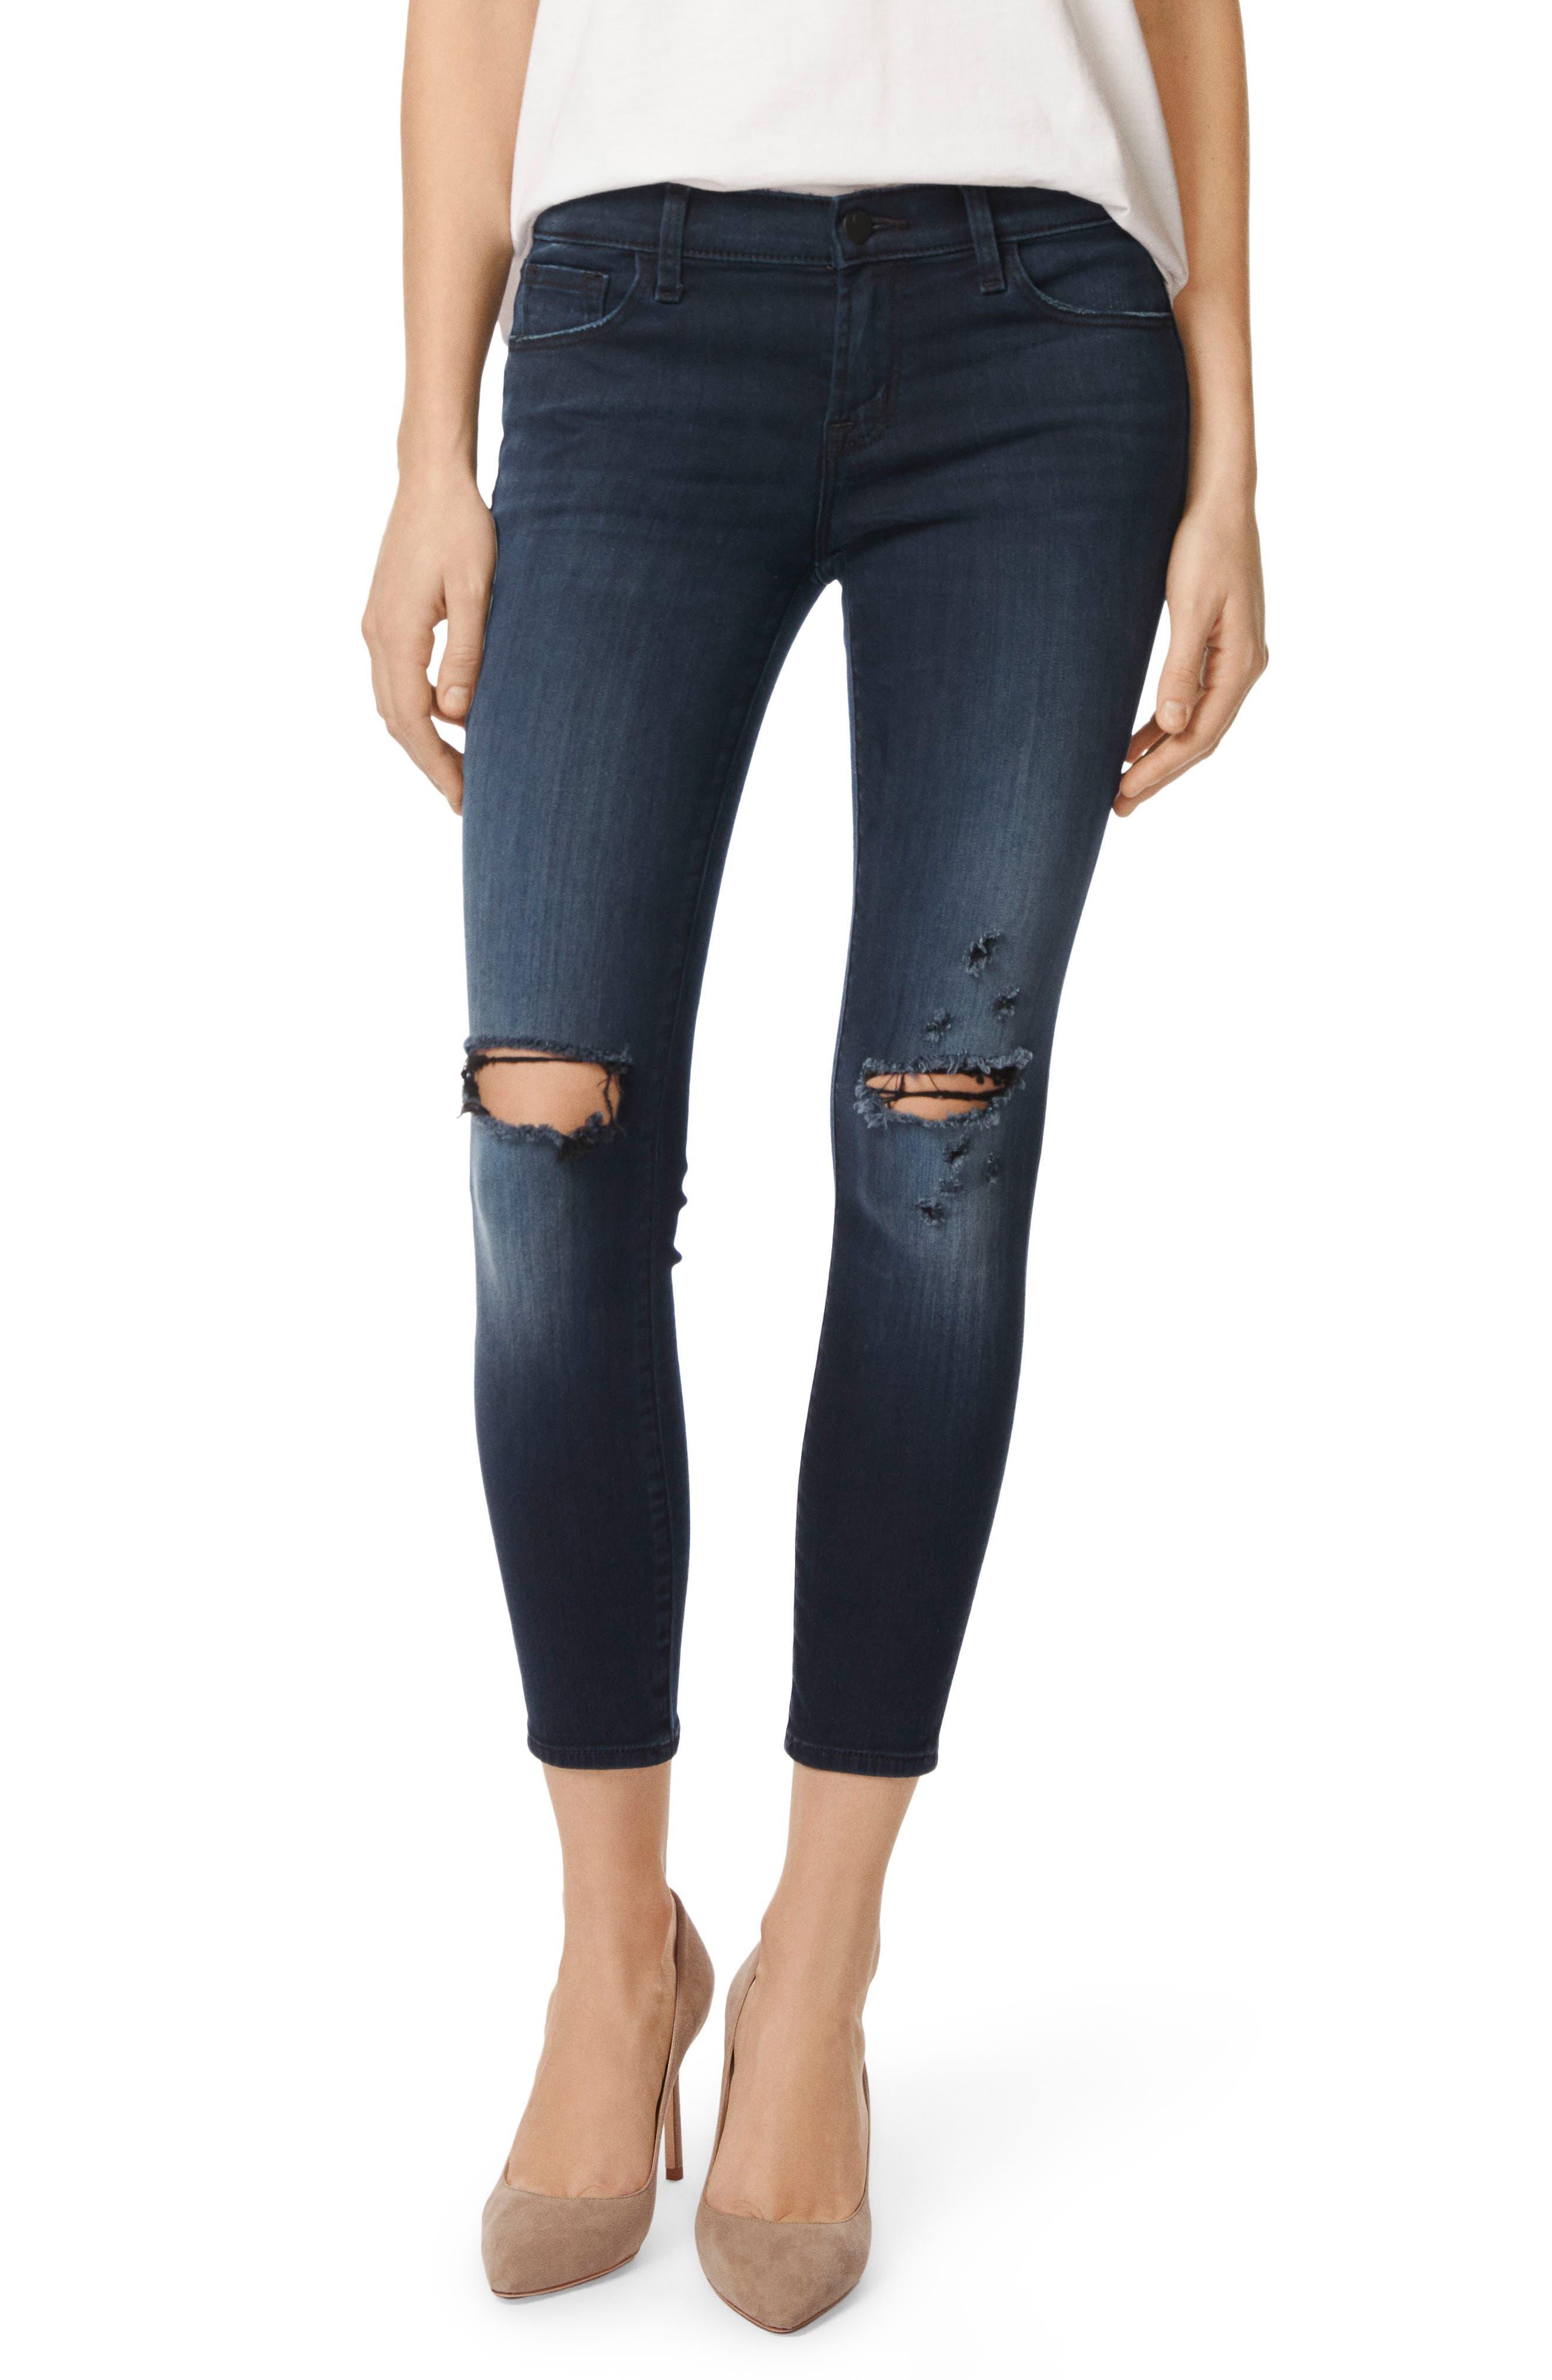 Main Image - J Brand 9326 Low Rise Crop Skinny Jeans (Black Sea)